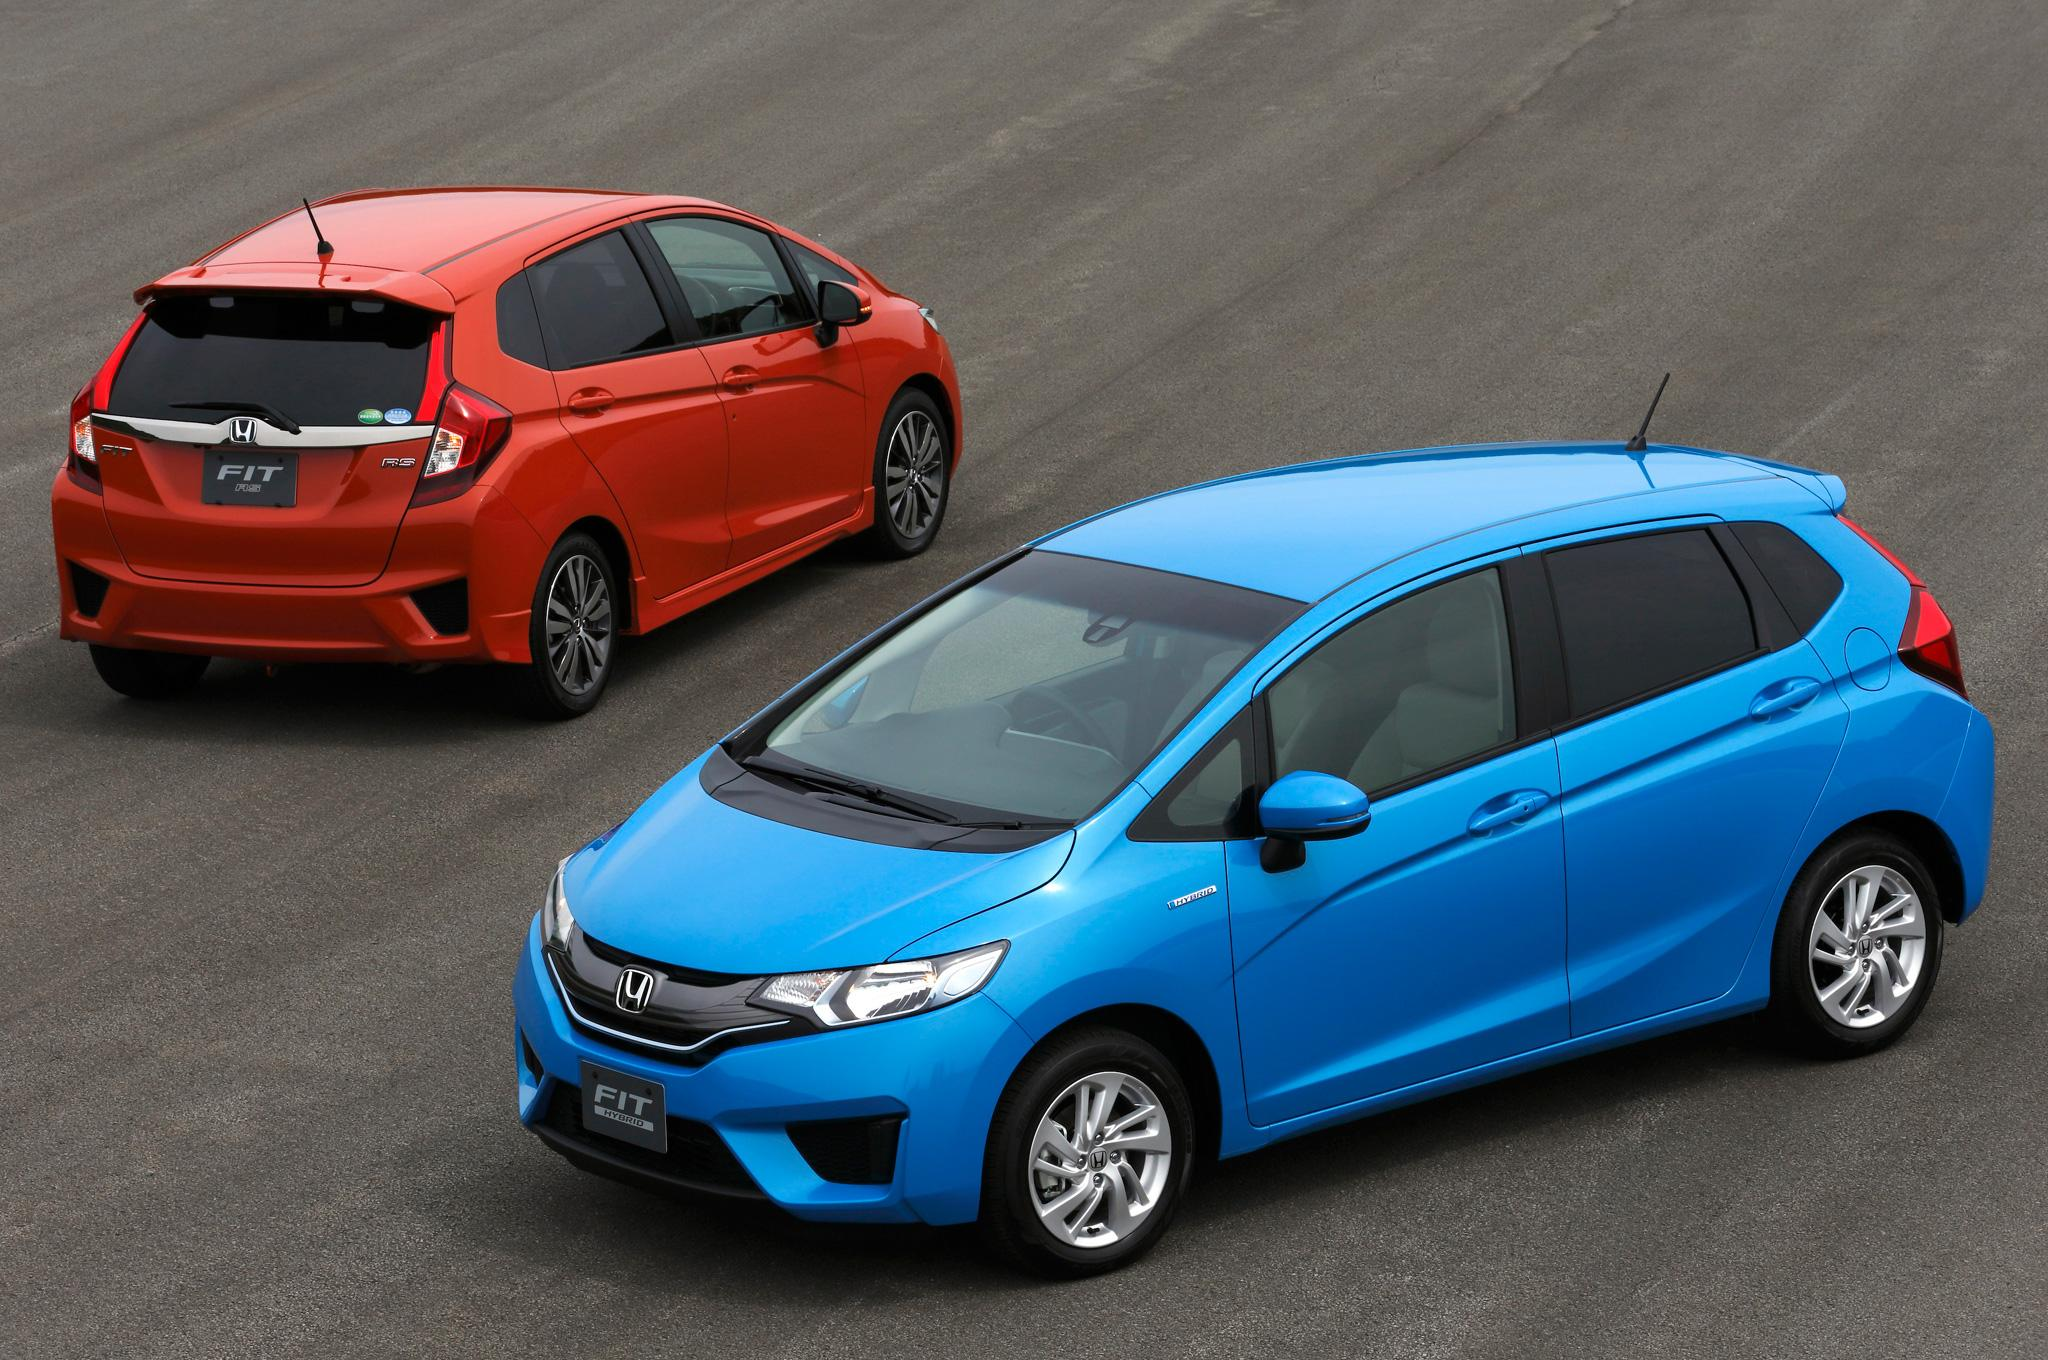 Novo-Honda-Fit-20146